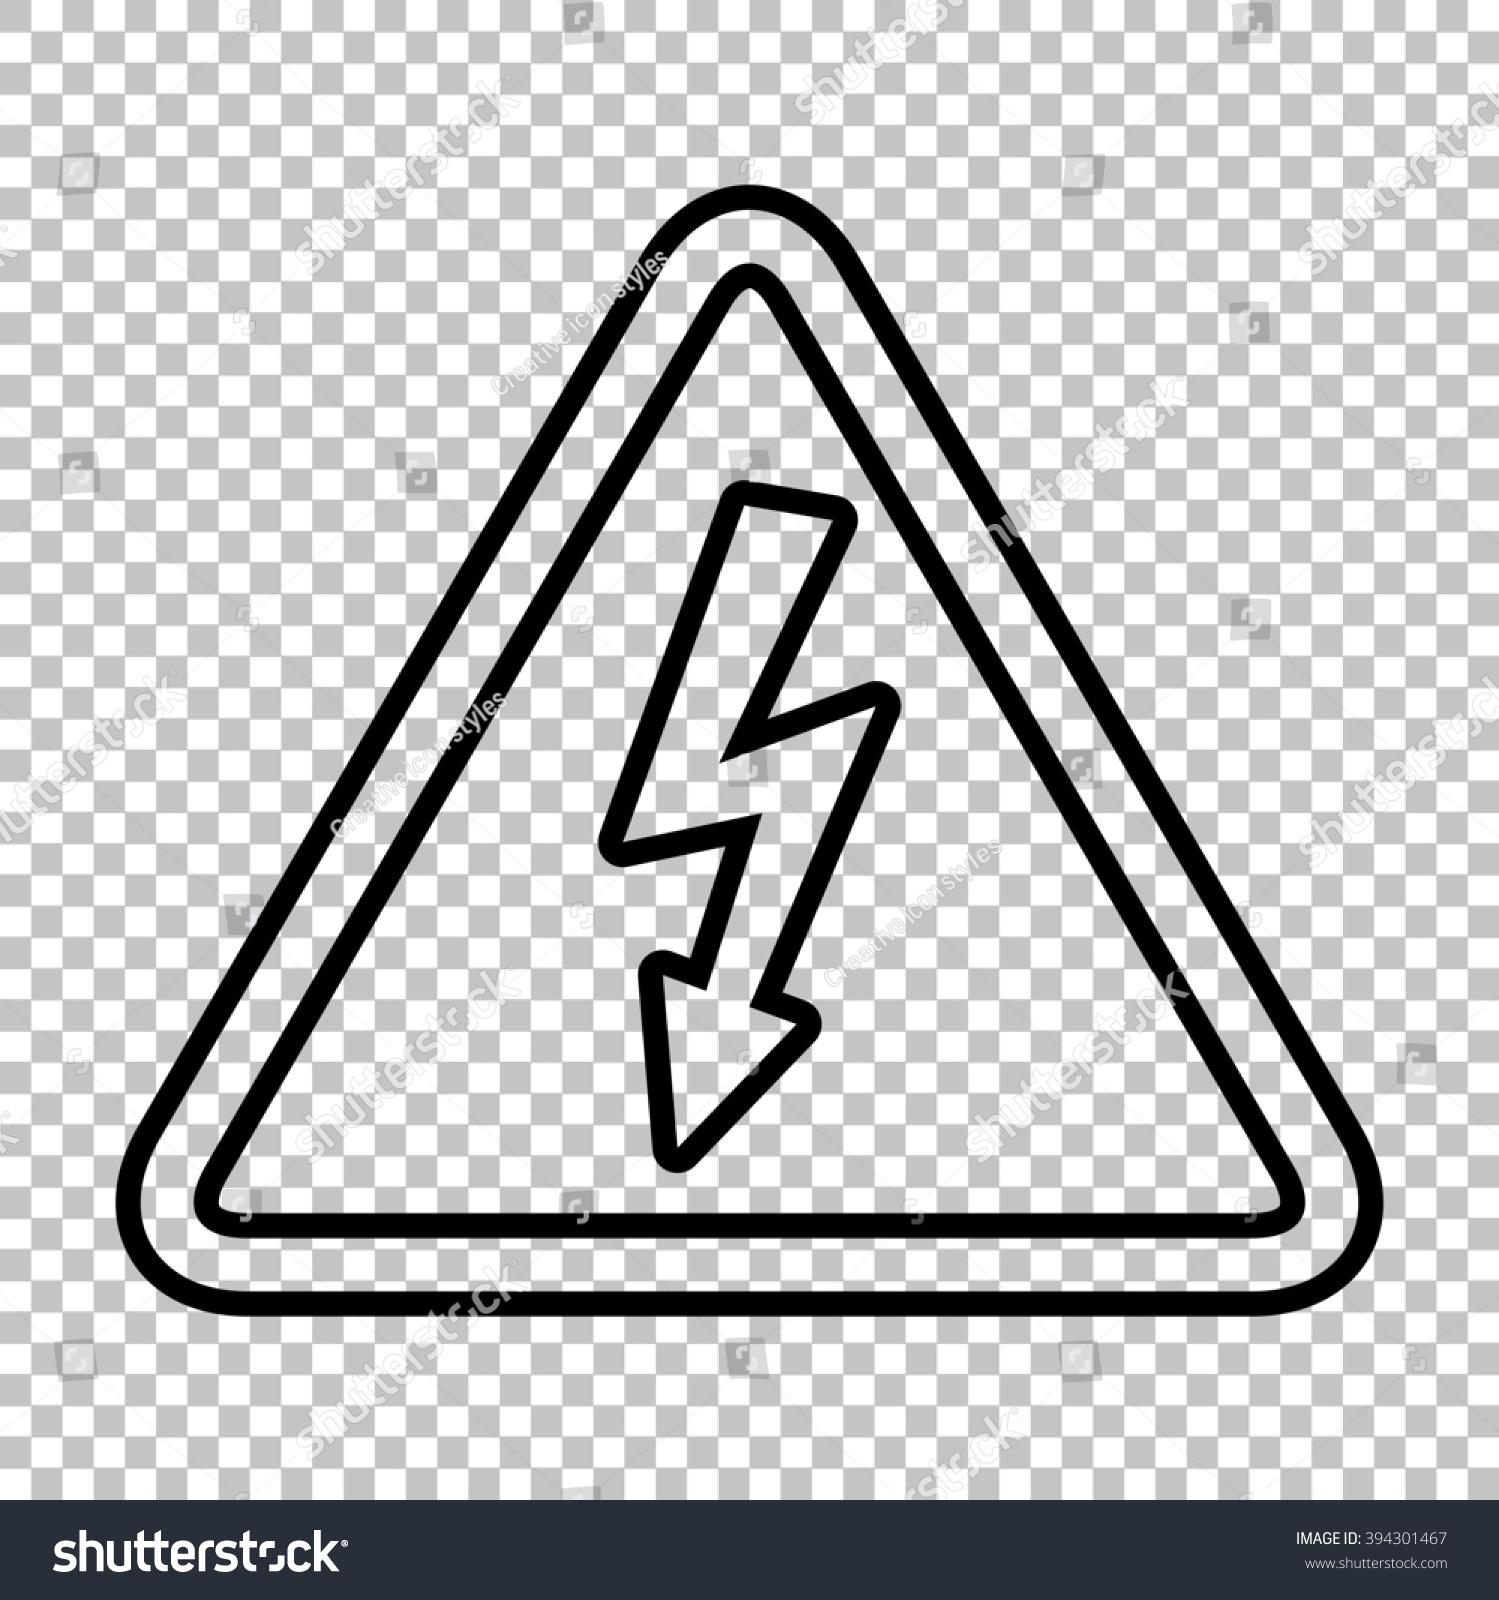 High Voltage Danger Sign Line Icon Stock Illustration 394301467 ...